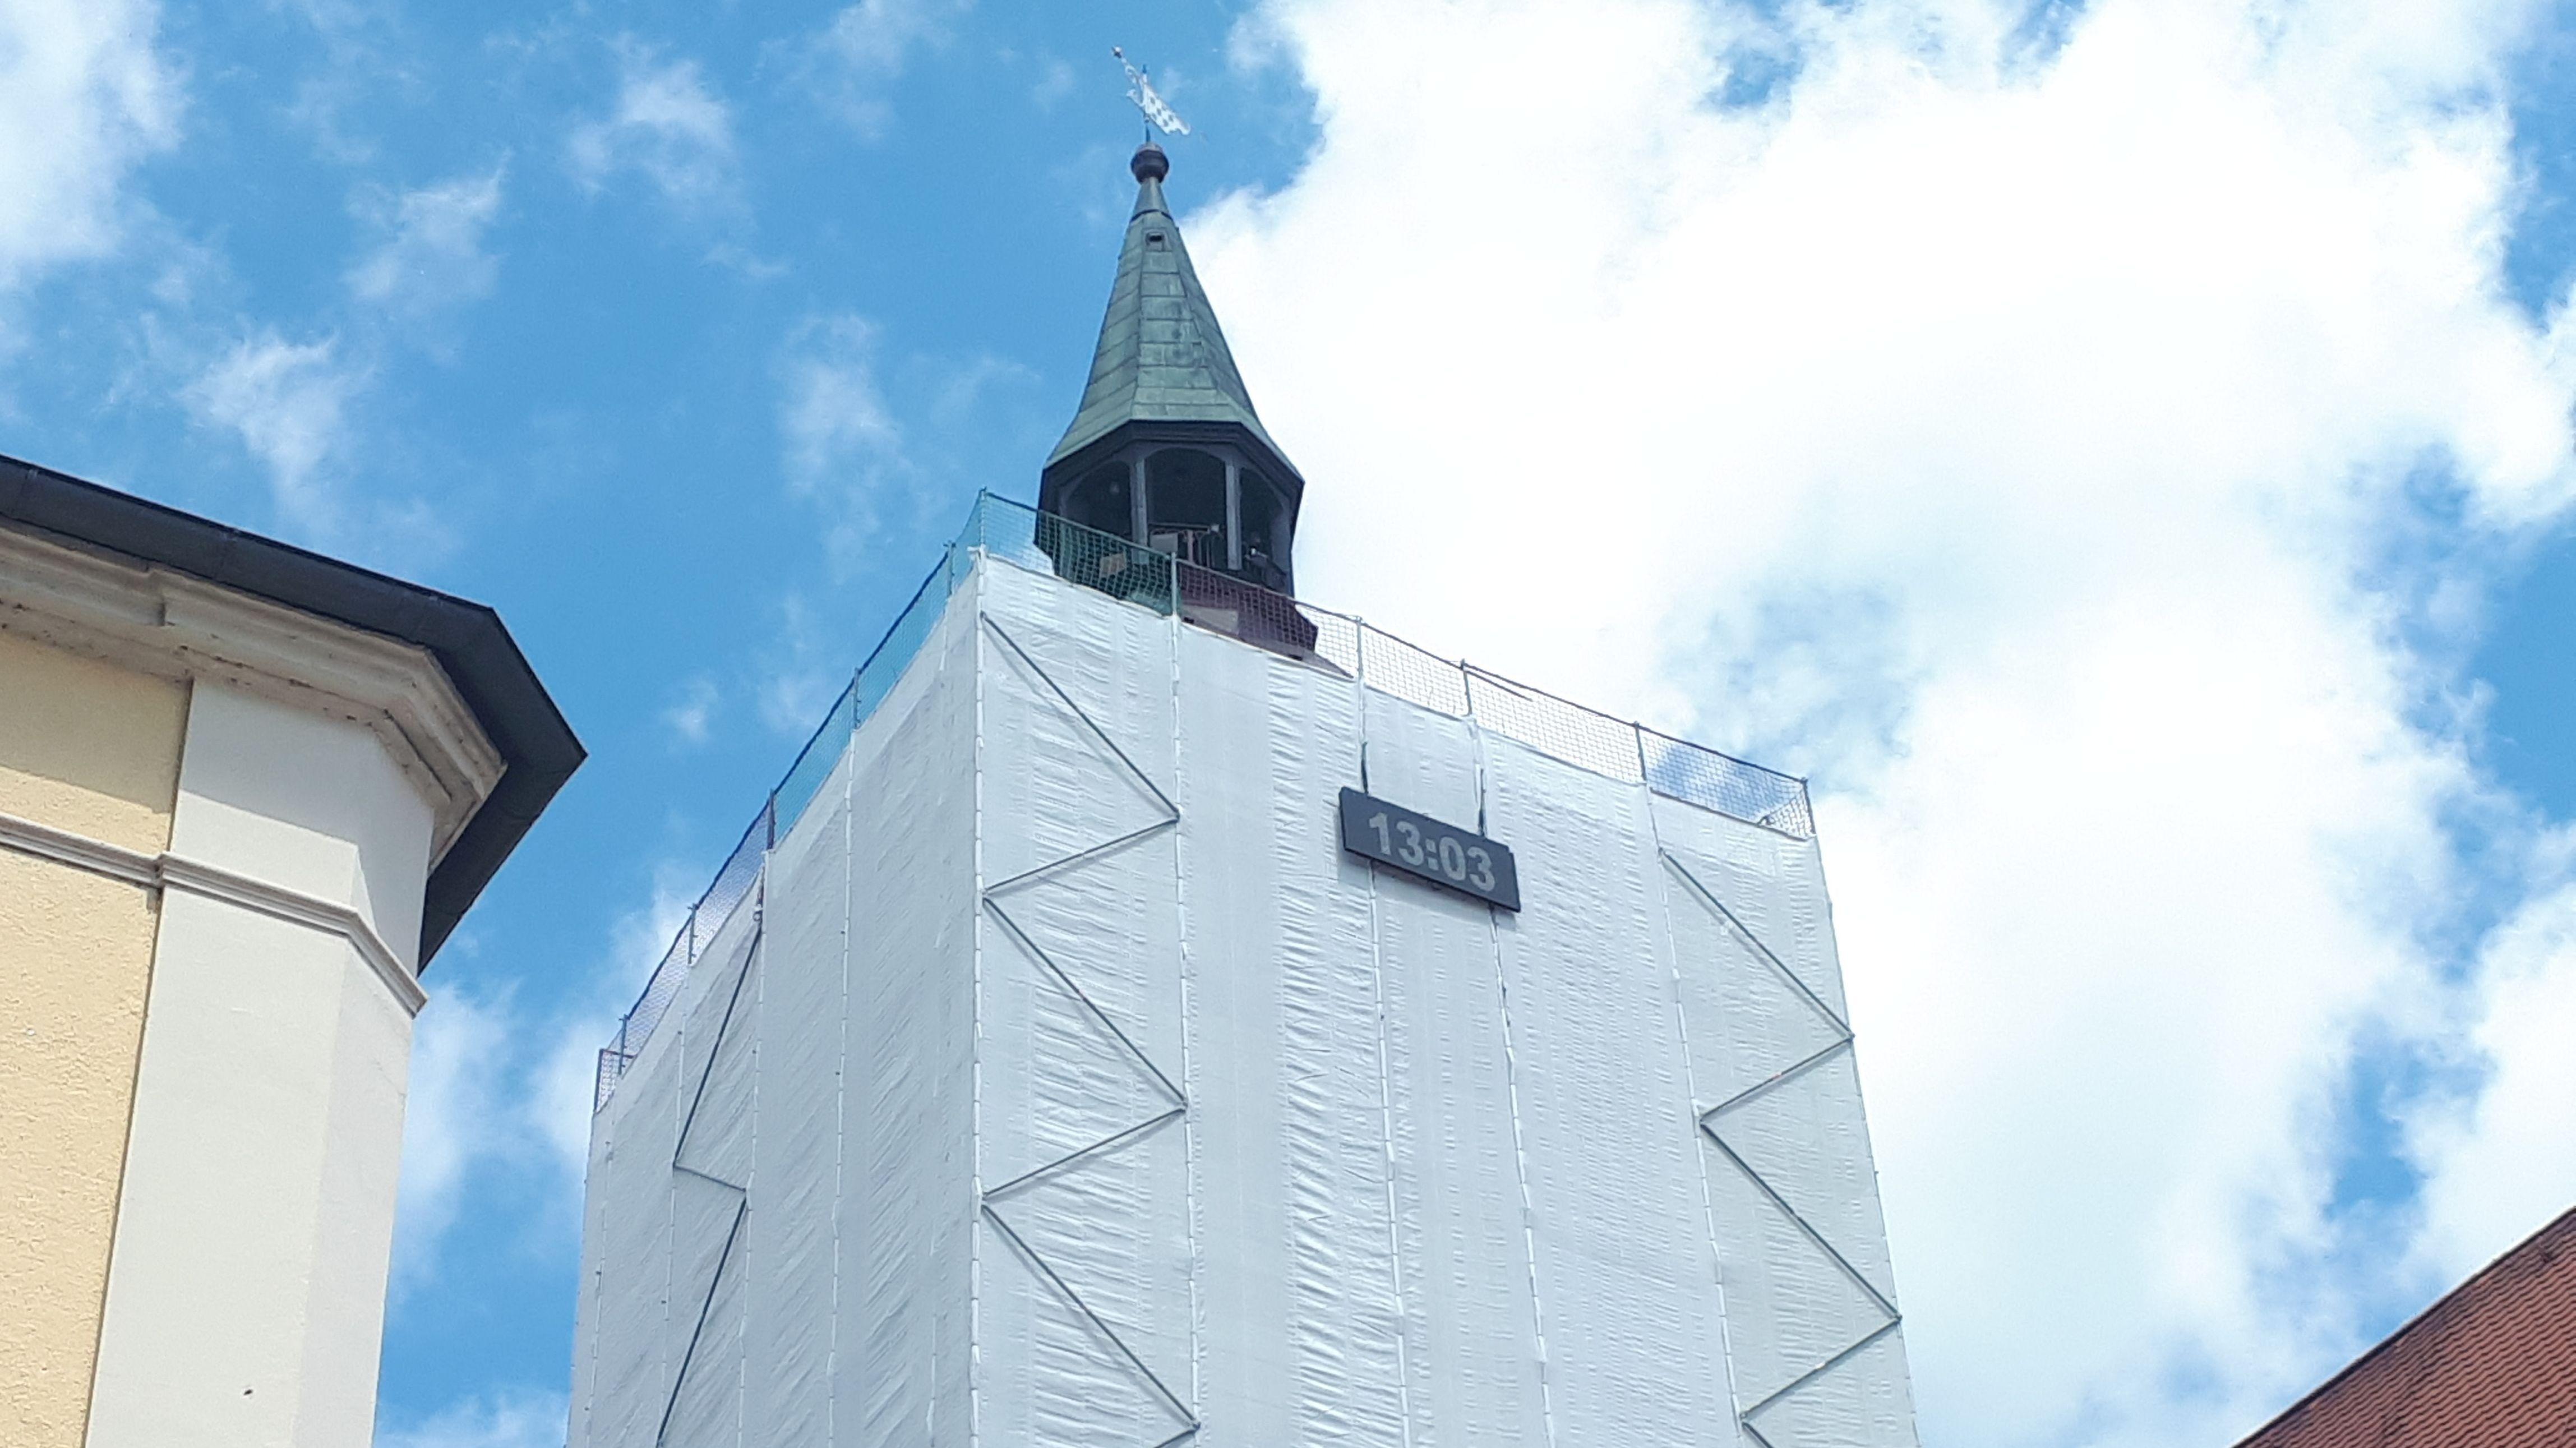 Die digitale Uhr am Gerüst des Deggendorfer Rathausturms